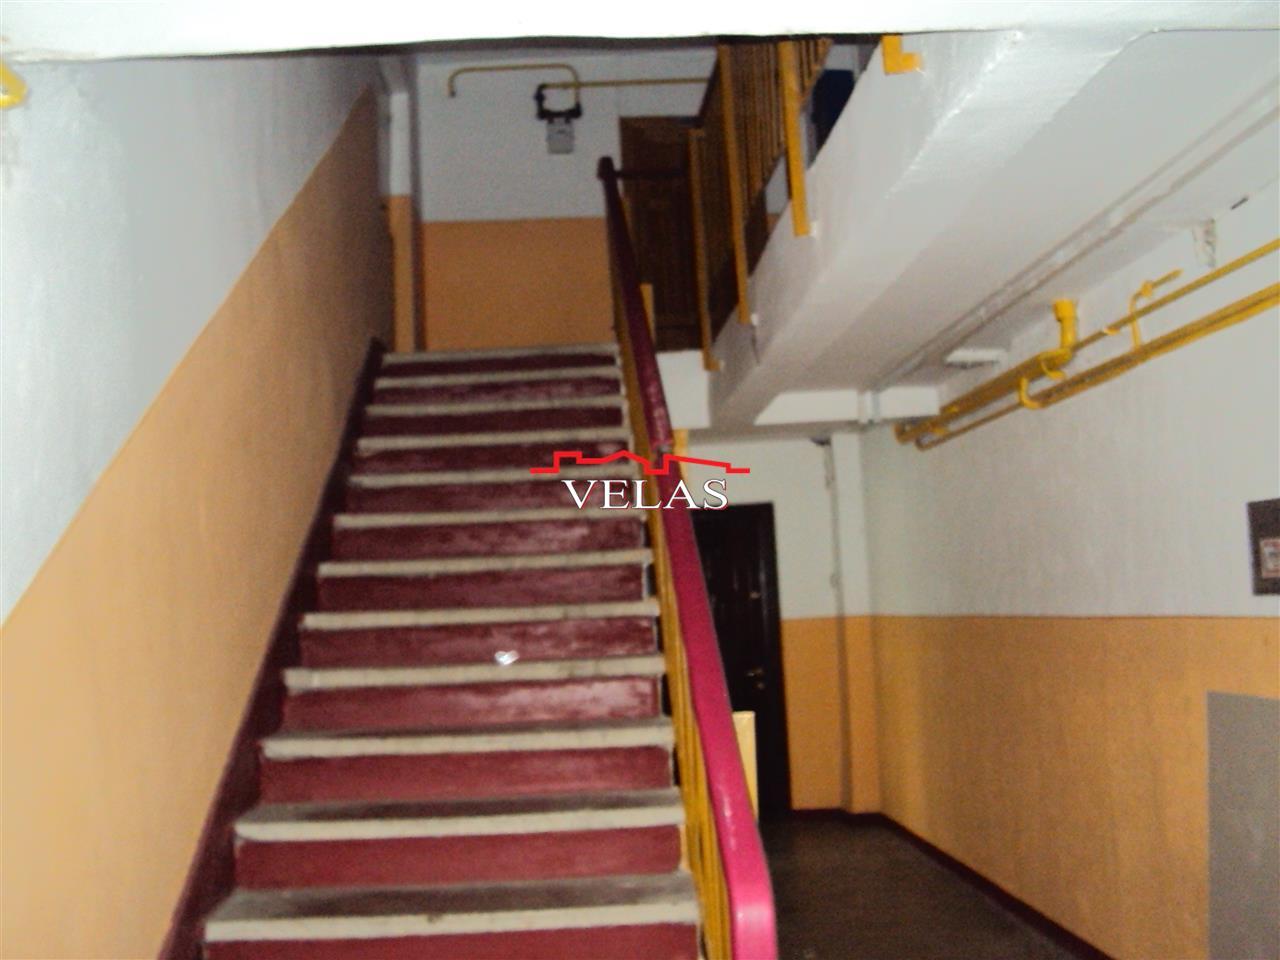 Apartament 2 camere, parter stradal, mobilat si utilat, str Razboieni